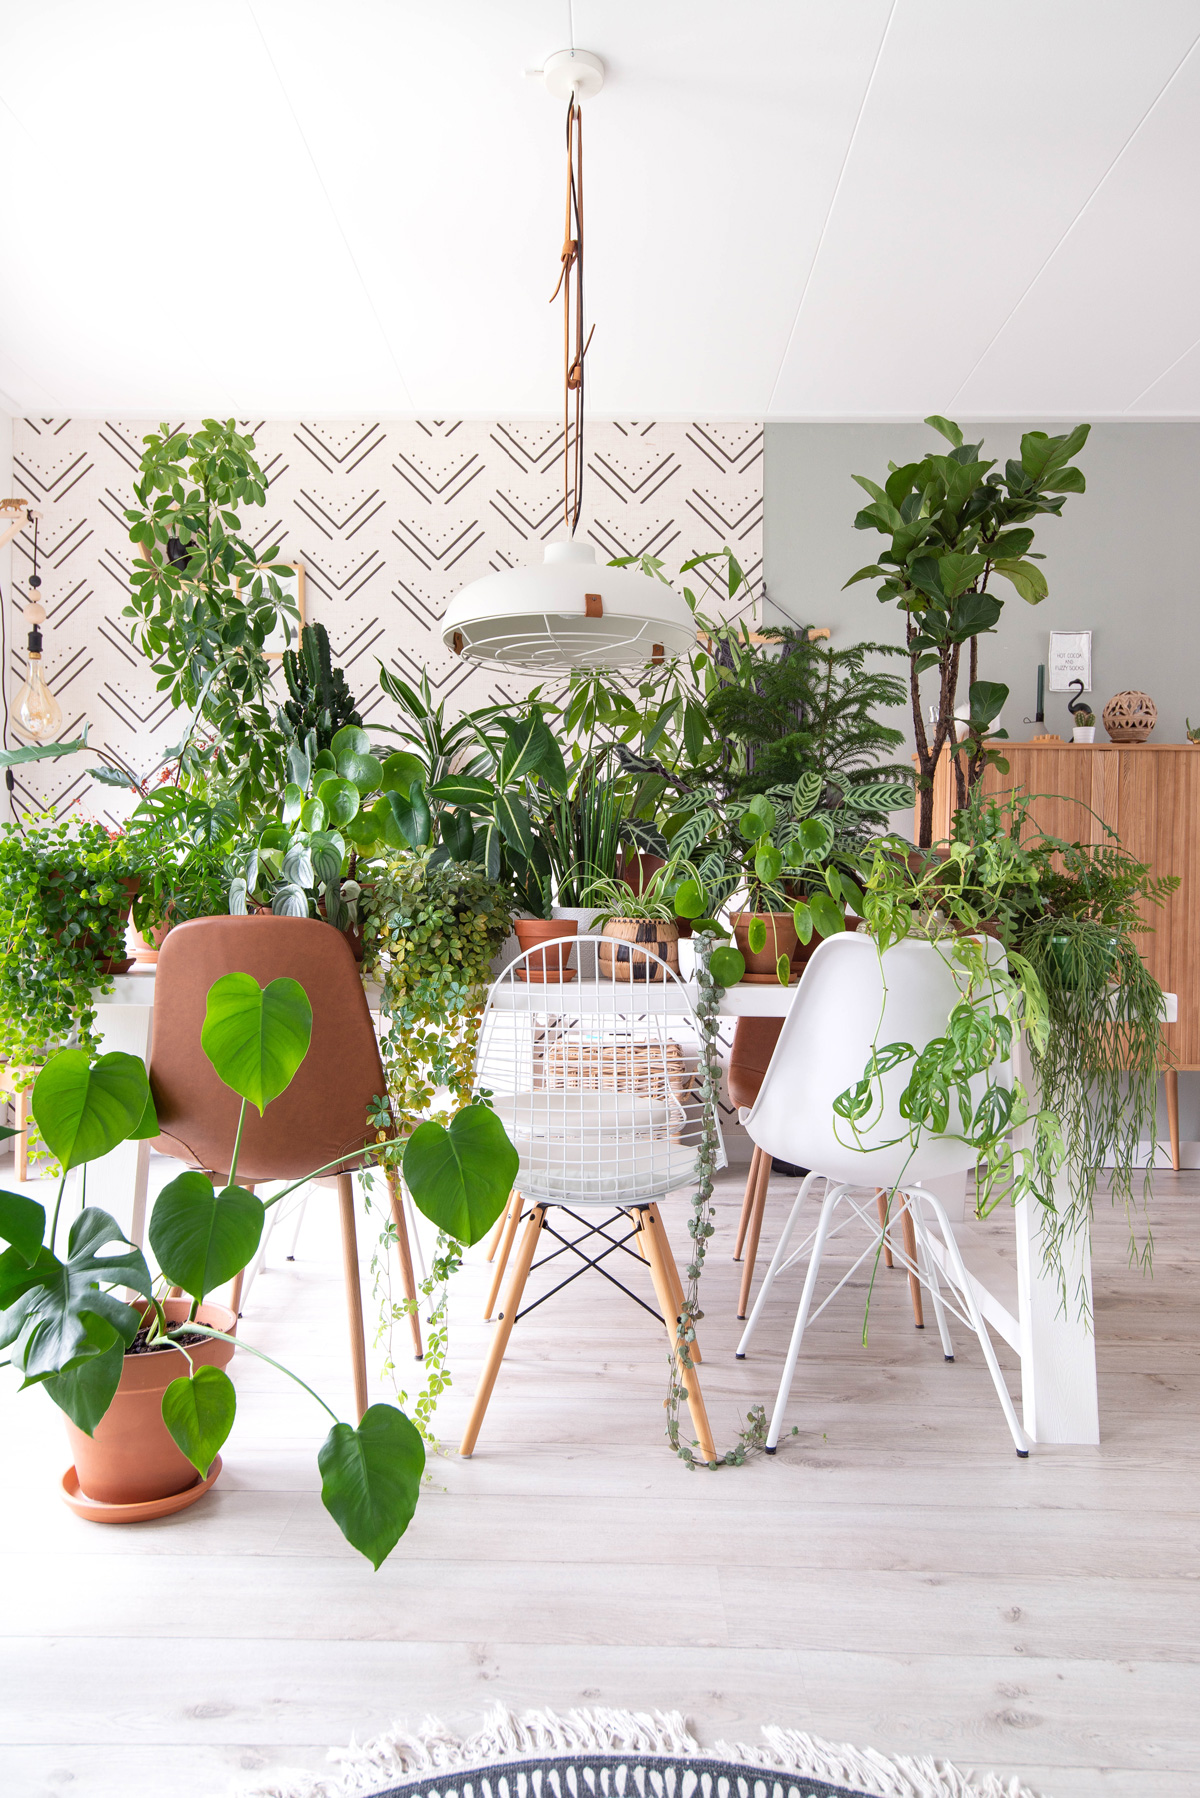 interieur keeelly91 urbanjungle jungalow houseplant crazyplantlady groenevingers diningroom eetkamer wallpaperdecor